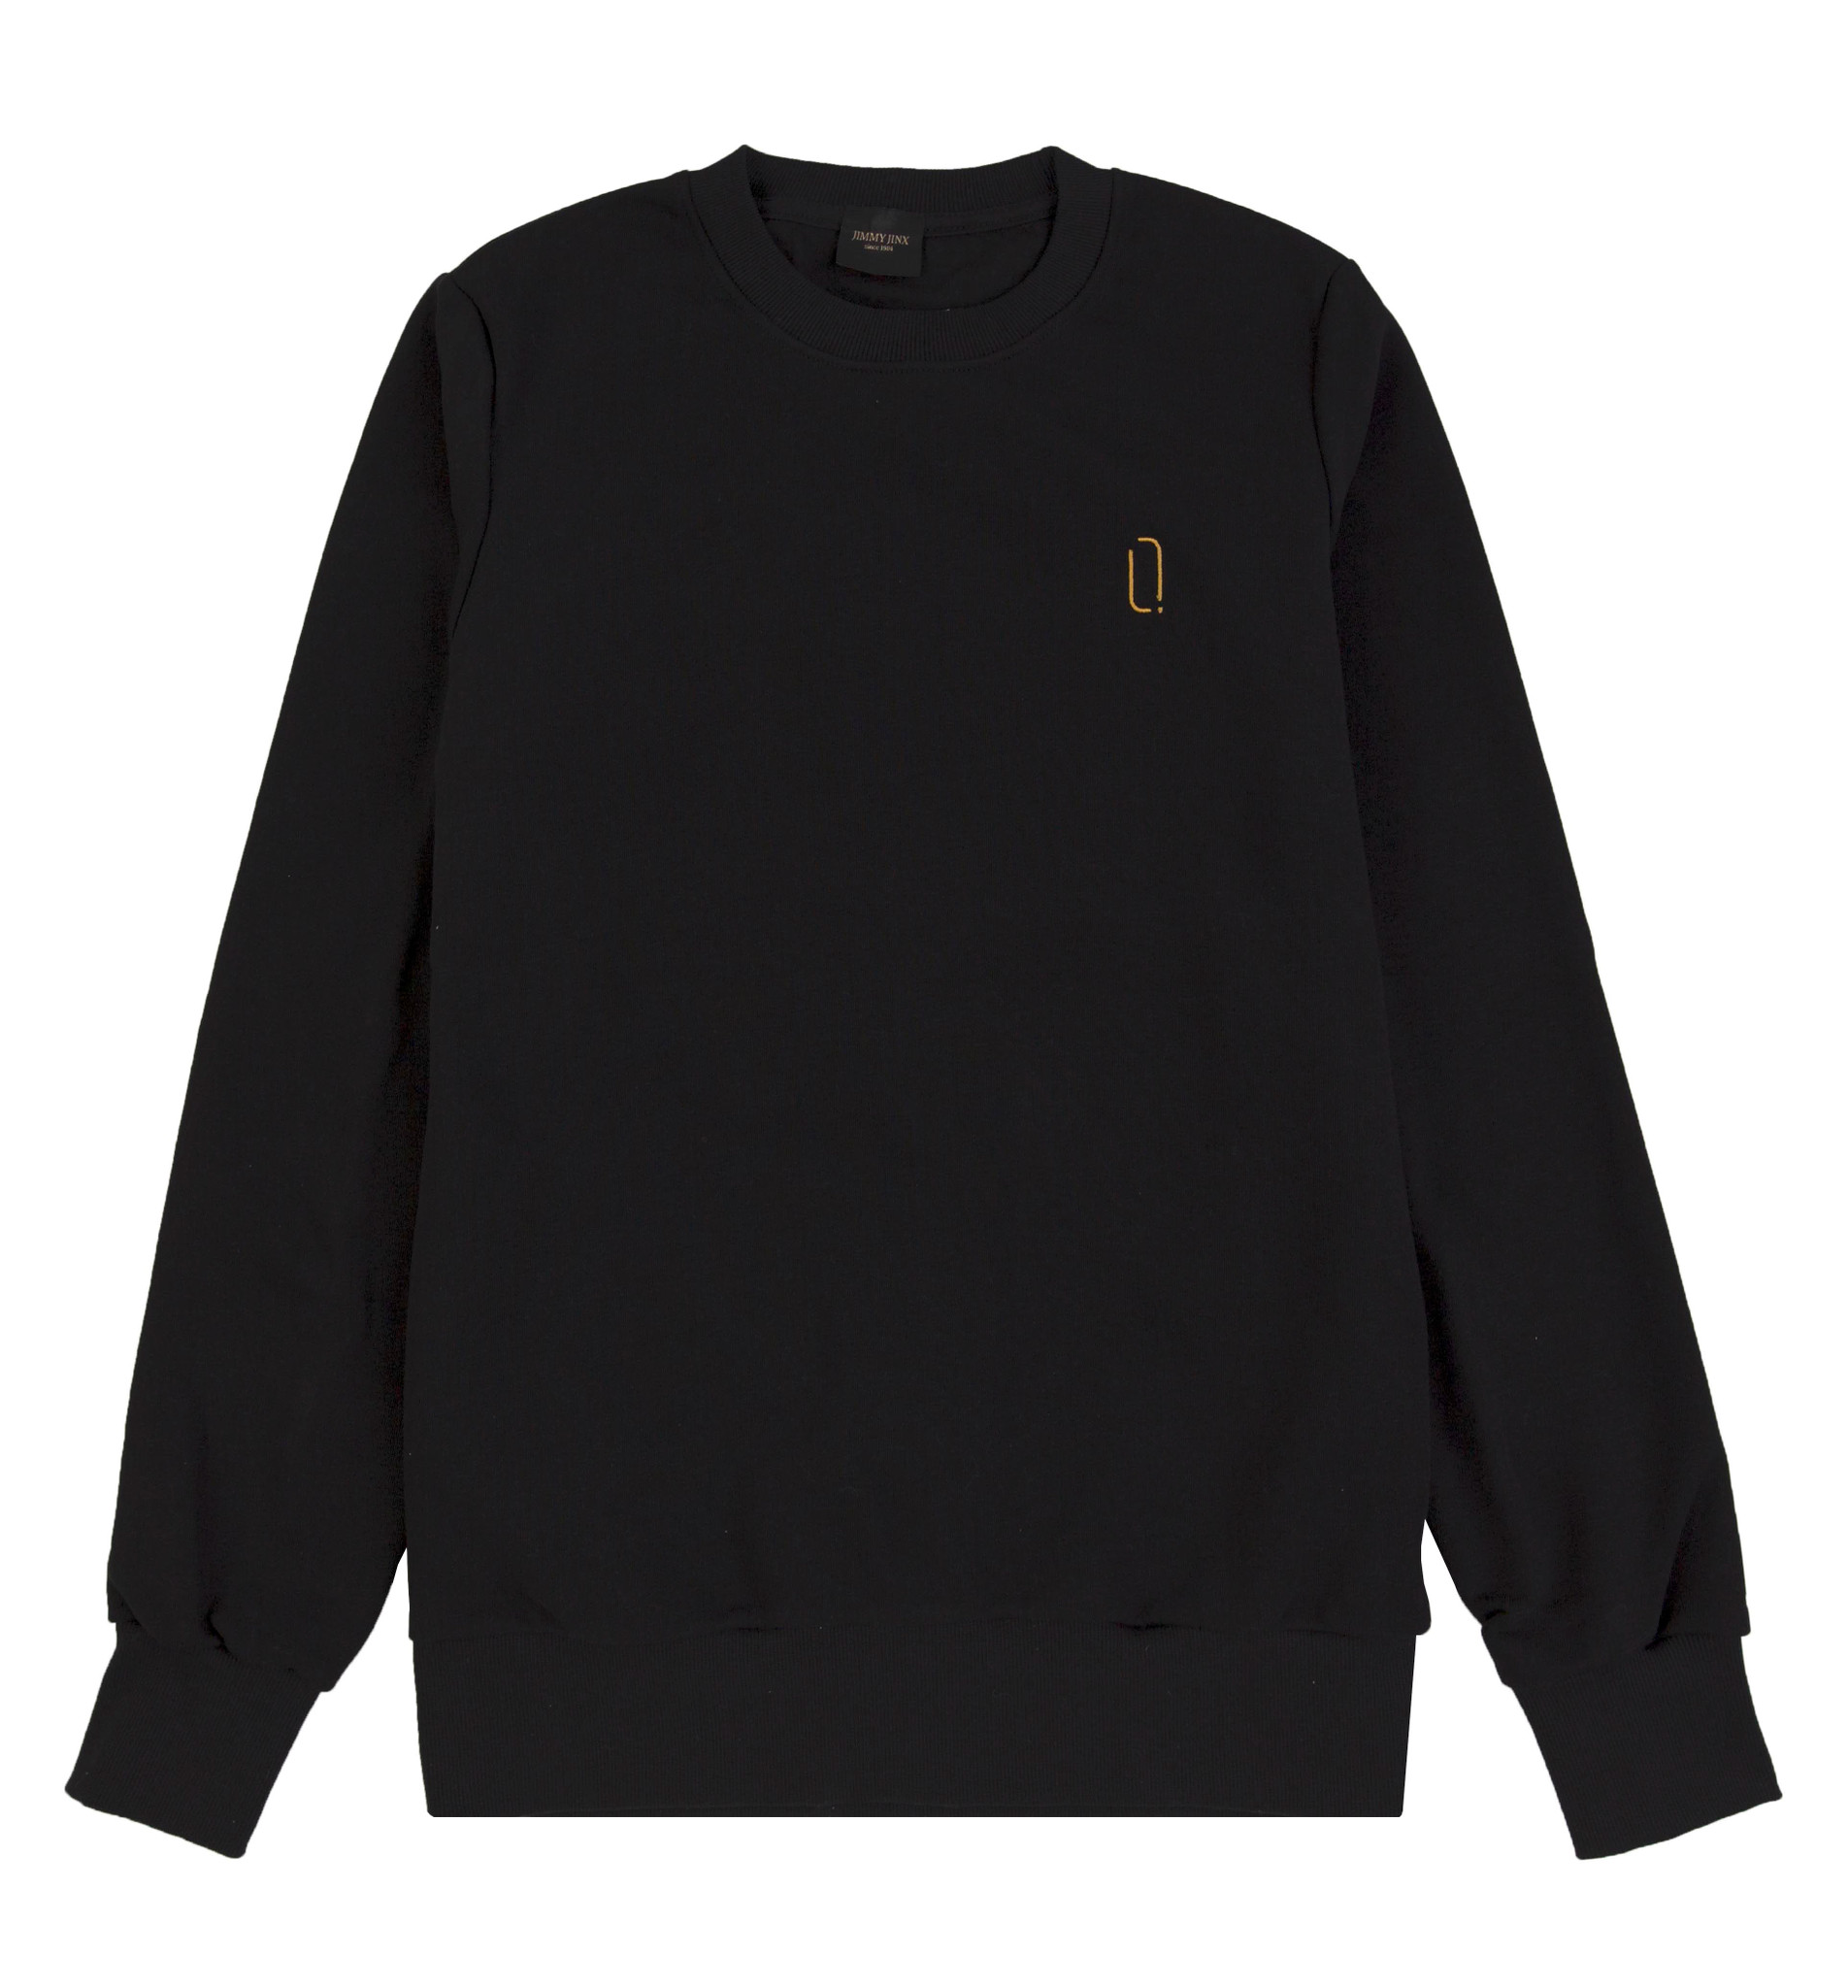 Czarna bluza unisex z haftem bez kaptura CREWNECK LOGO BLACK - Jimmy Jinx